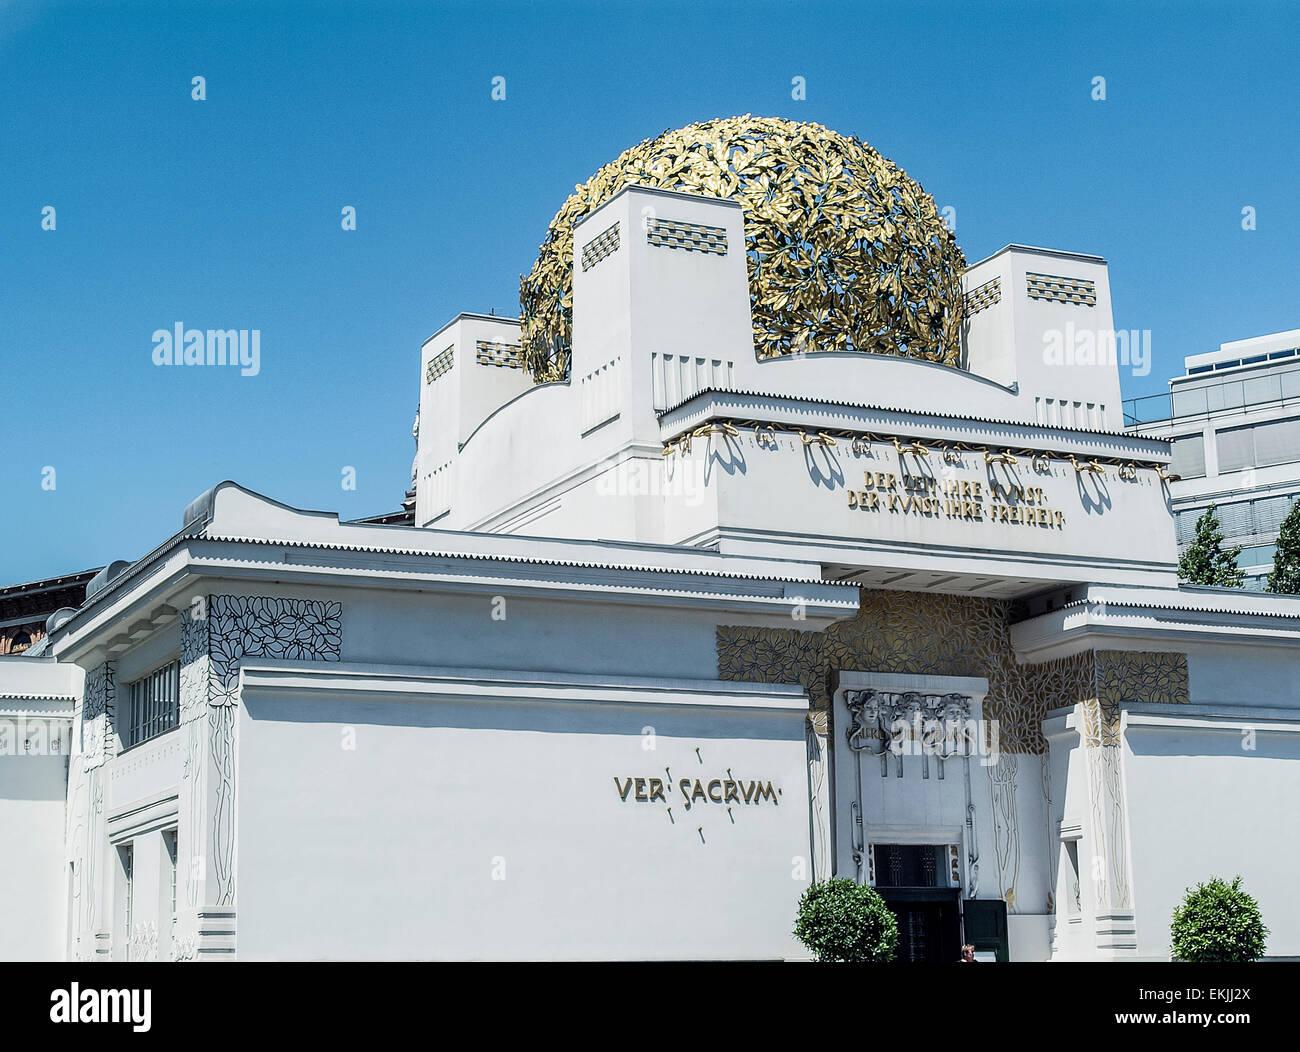 Secession house in vienna austria europe - Stock Image